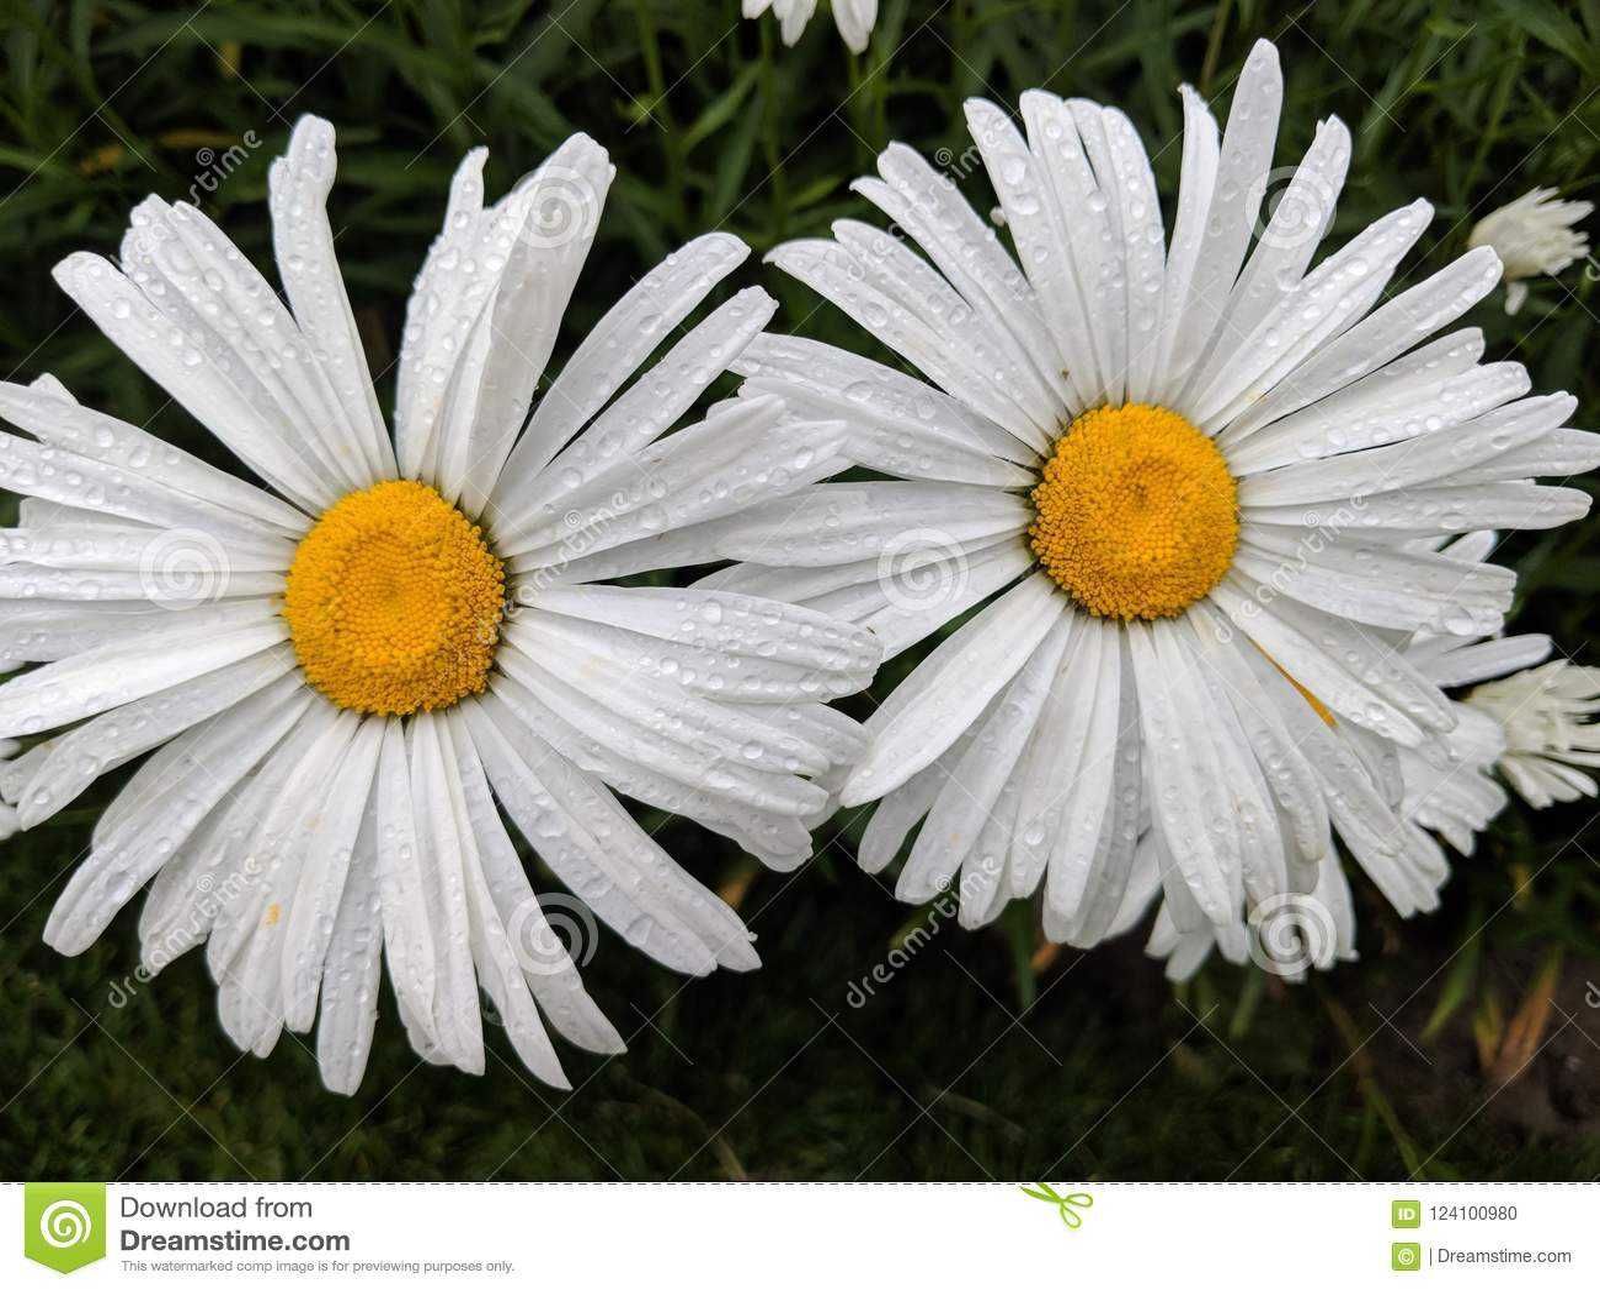 Double daisies stock photo image of double side white 124100980 download double daisies stock photo image of double side white 124100980 izmirmasajfo